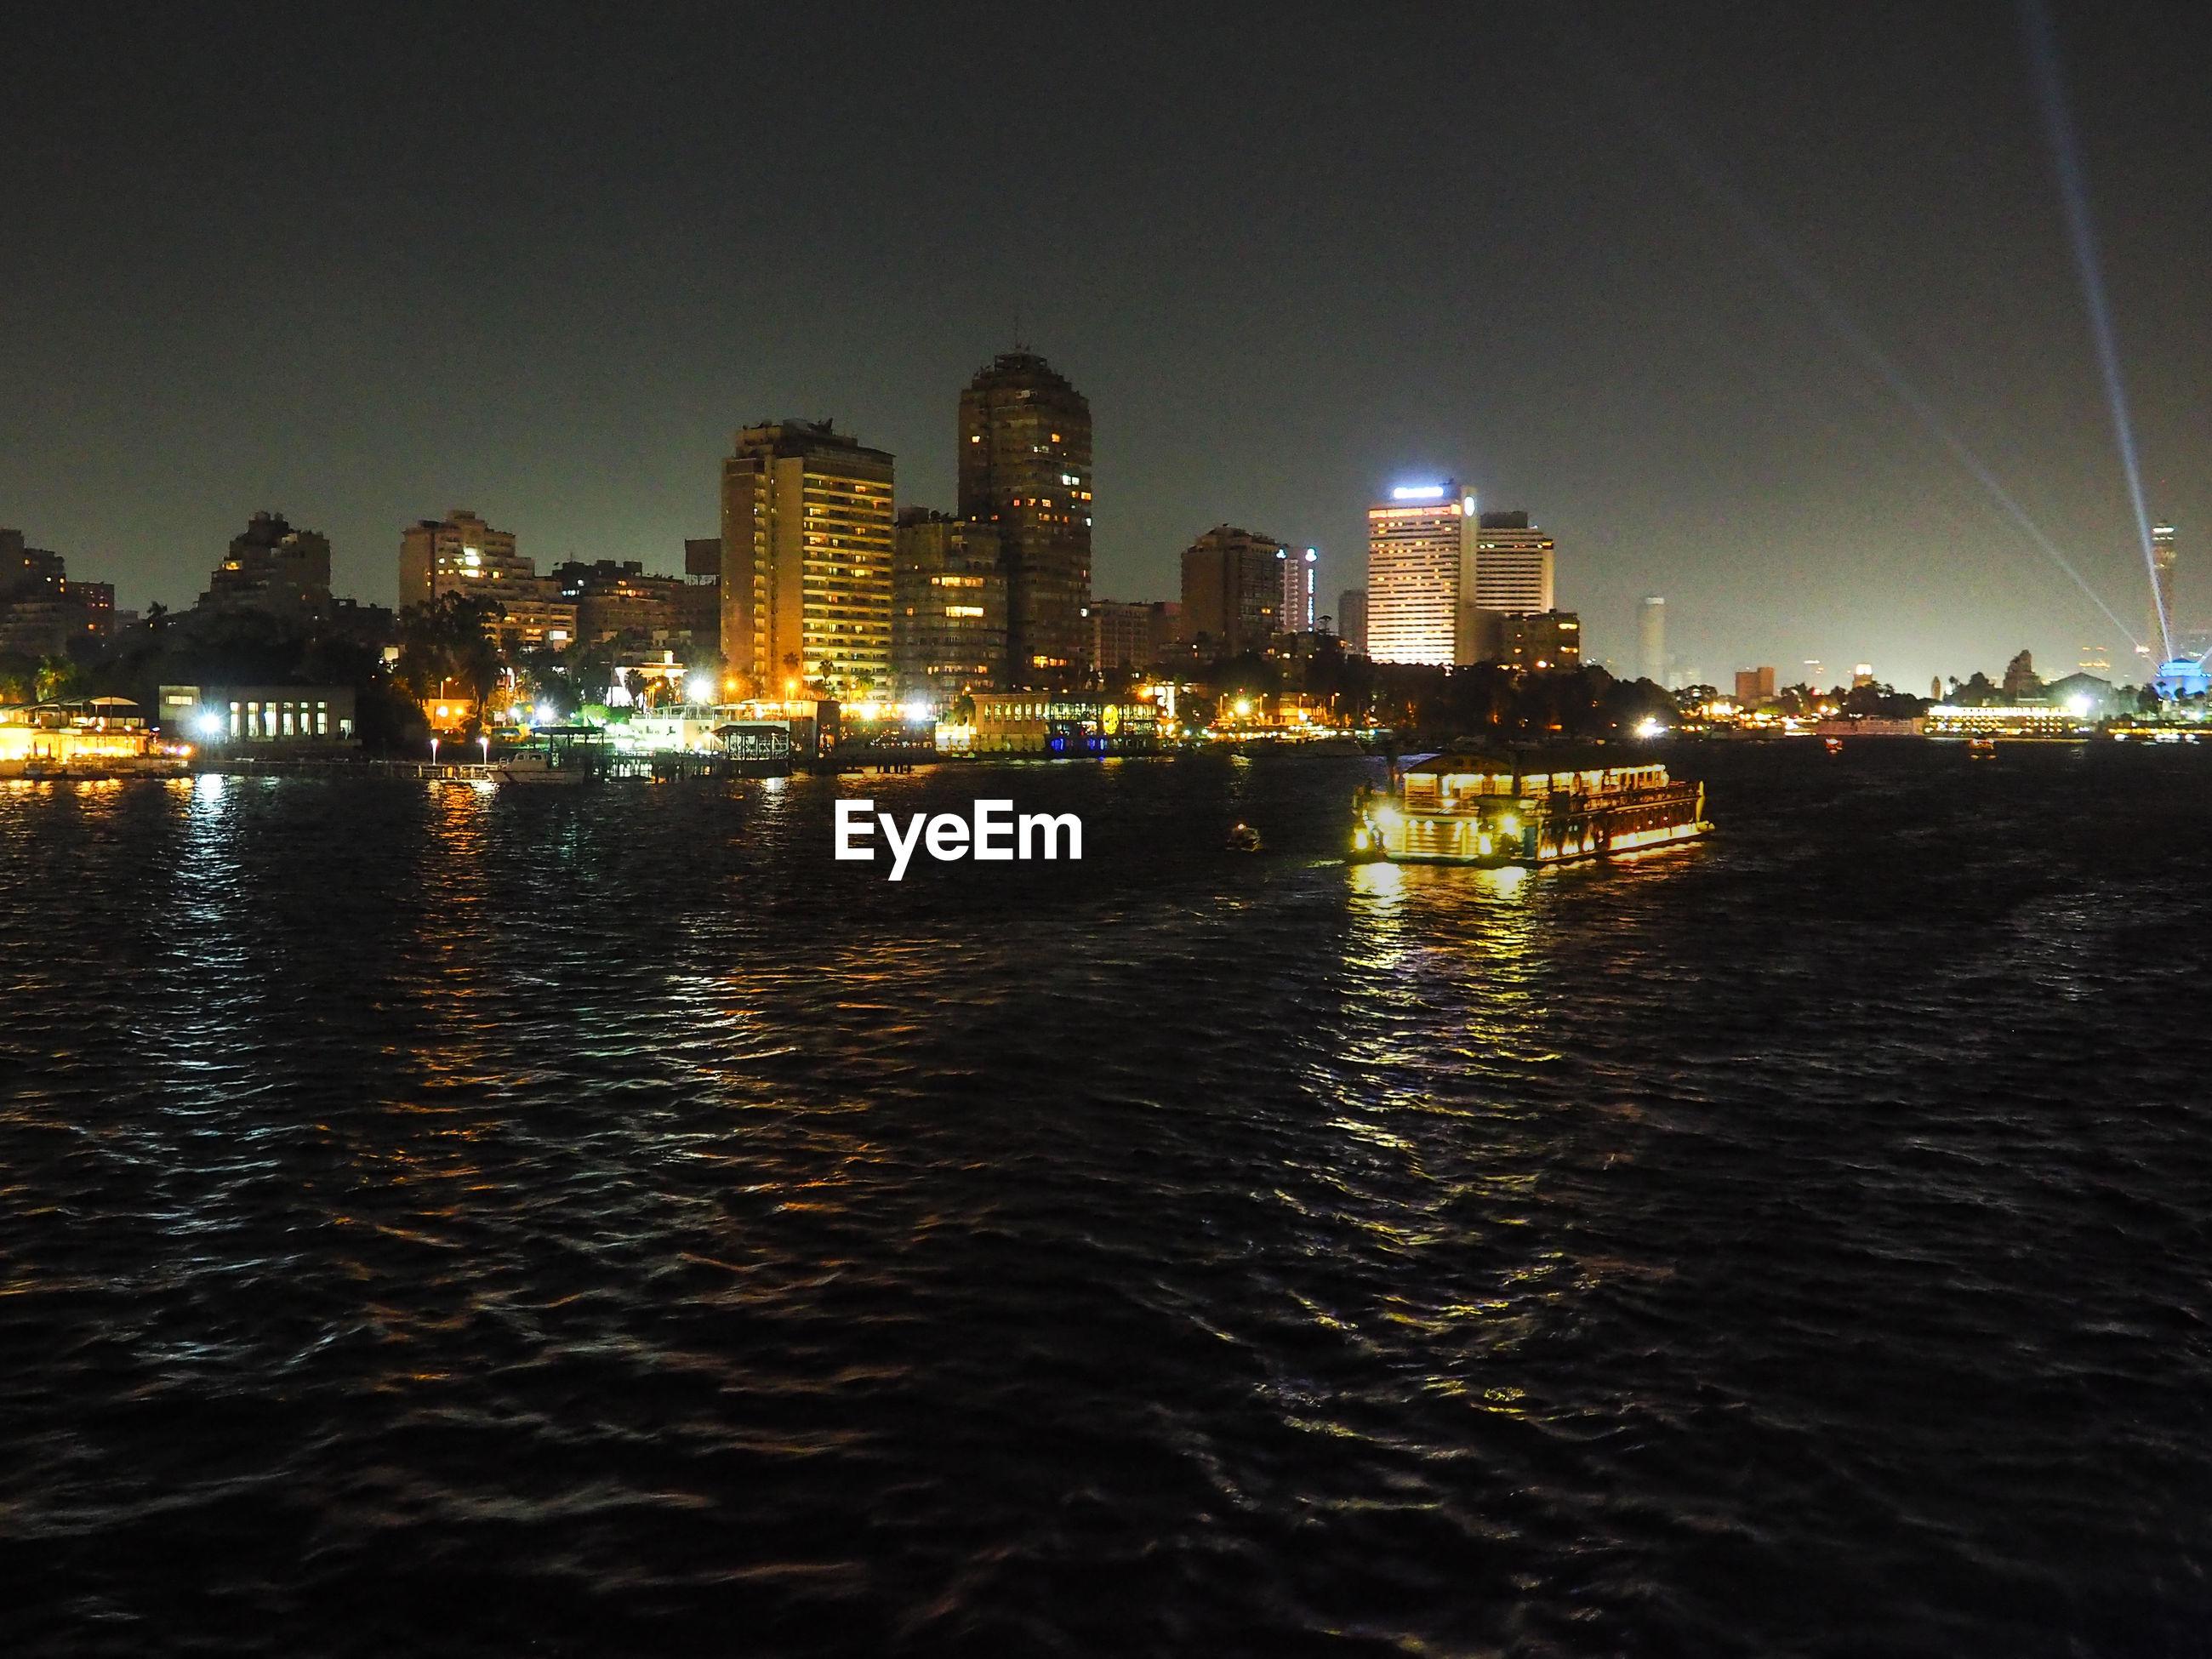 ILLUMINATED BUILDINGS BY SEA AT NIGHT